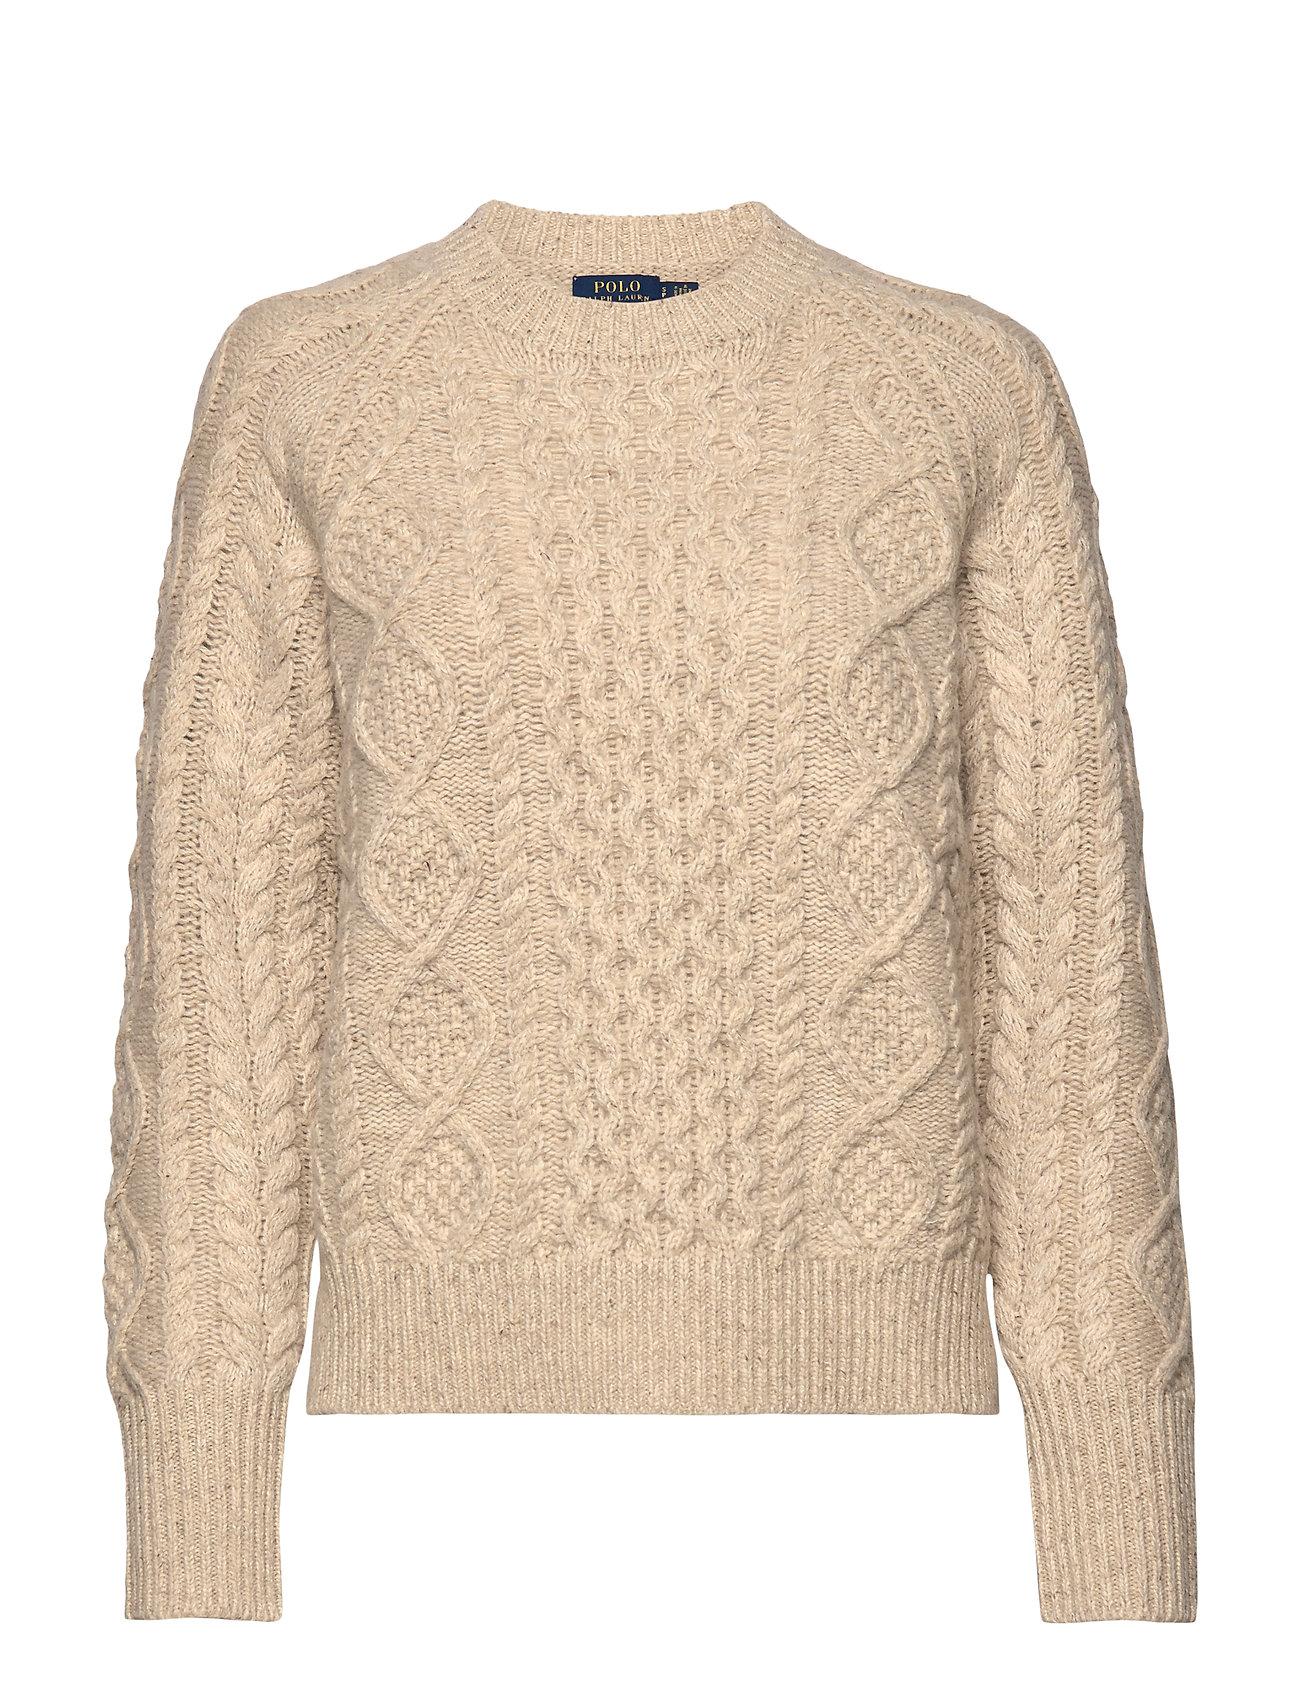 Polo Ralph Lauren Aran-Knit Wool-Blend Sweater - OATMEAL